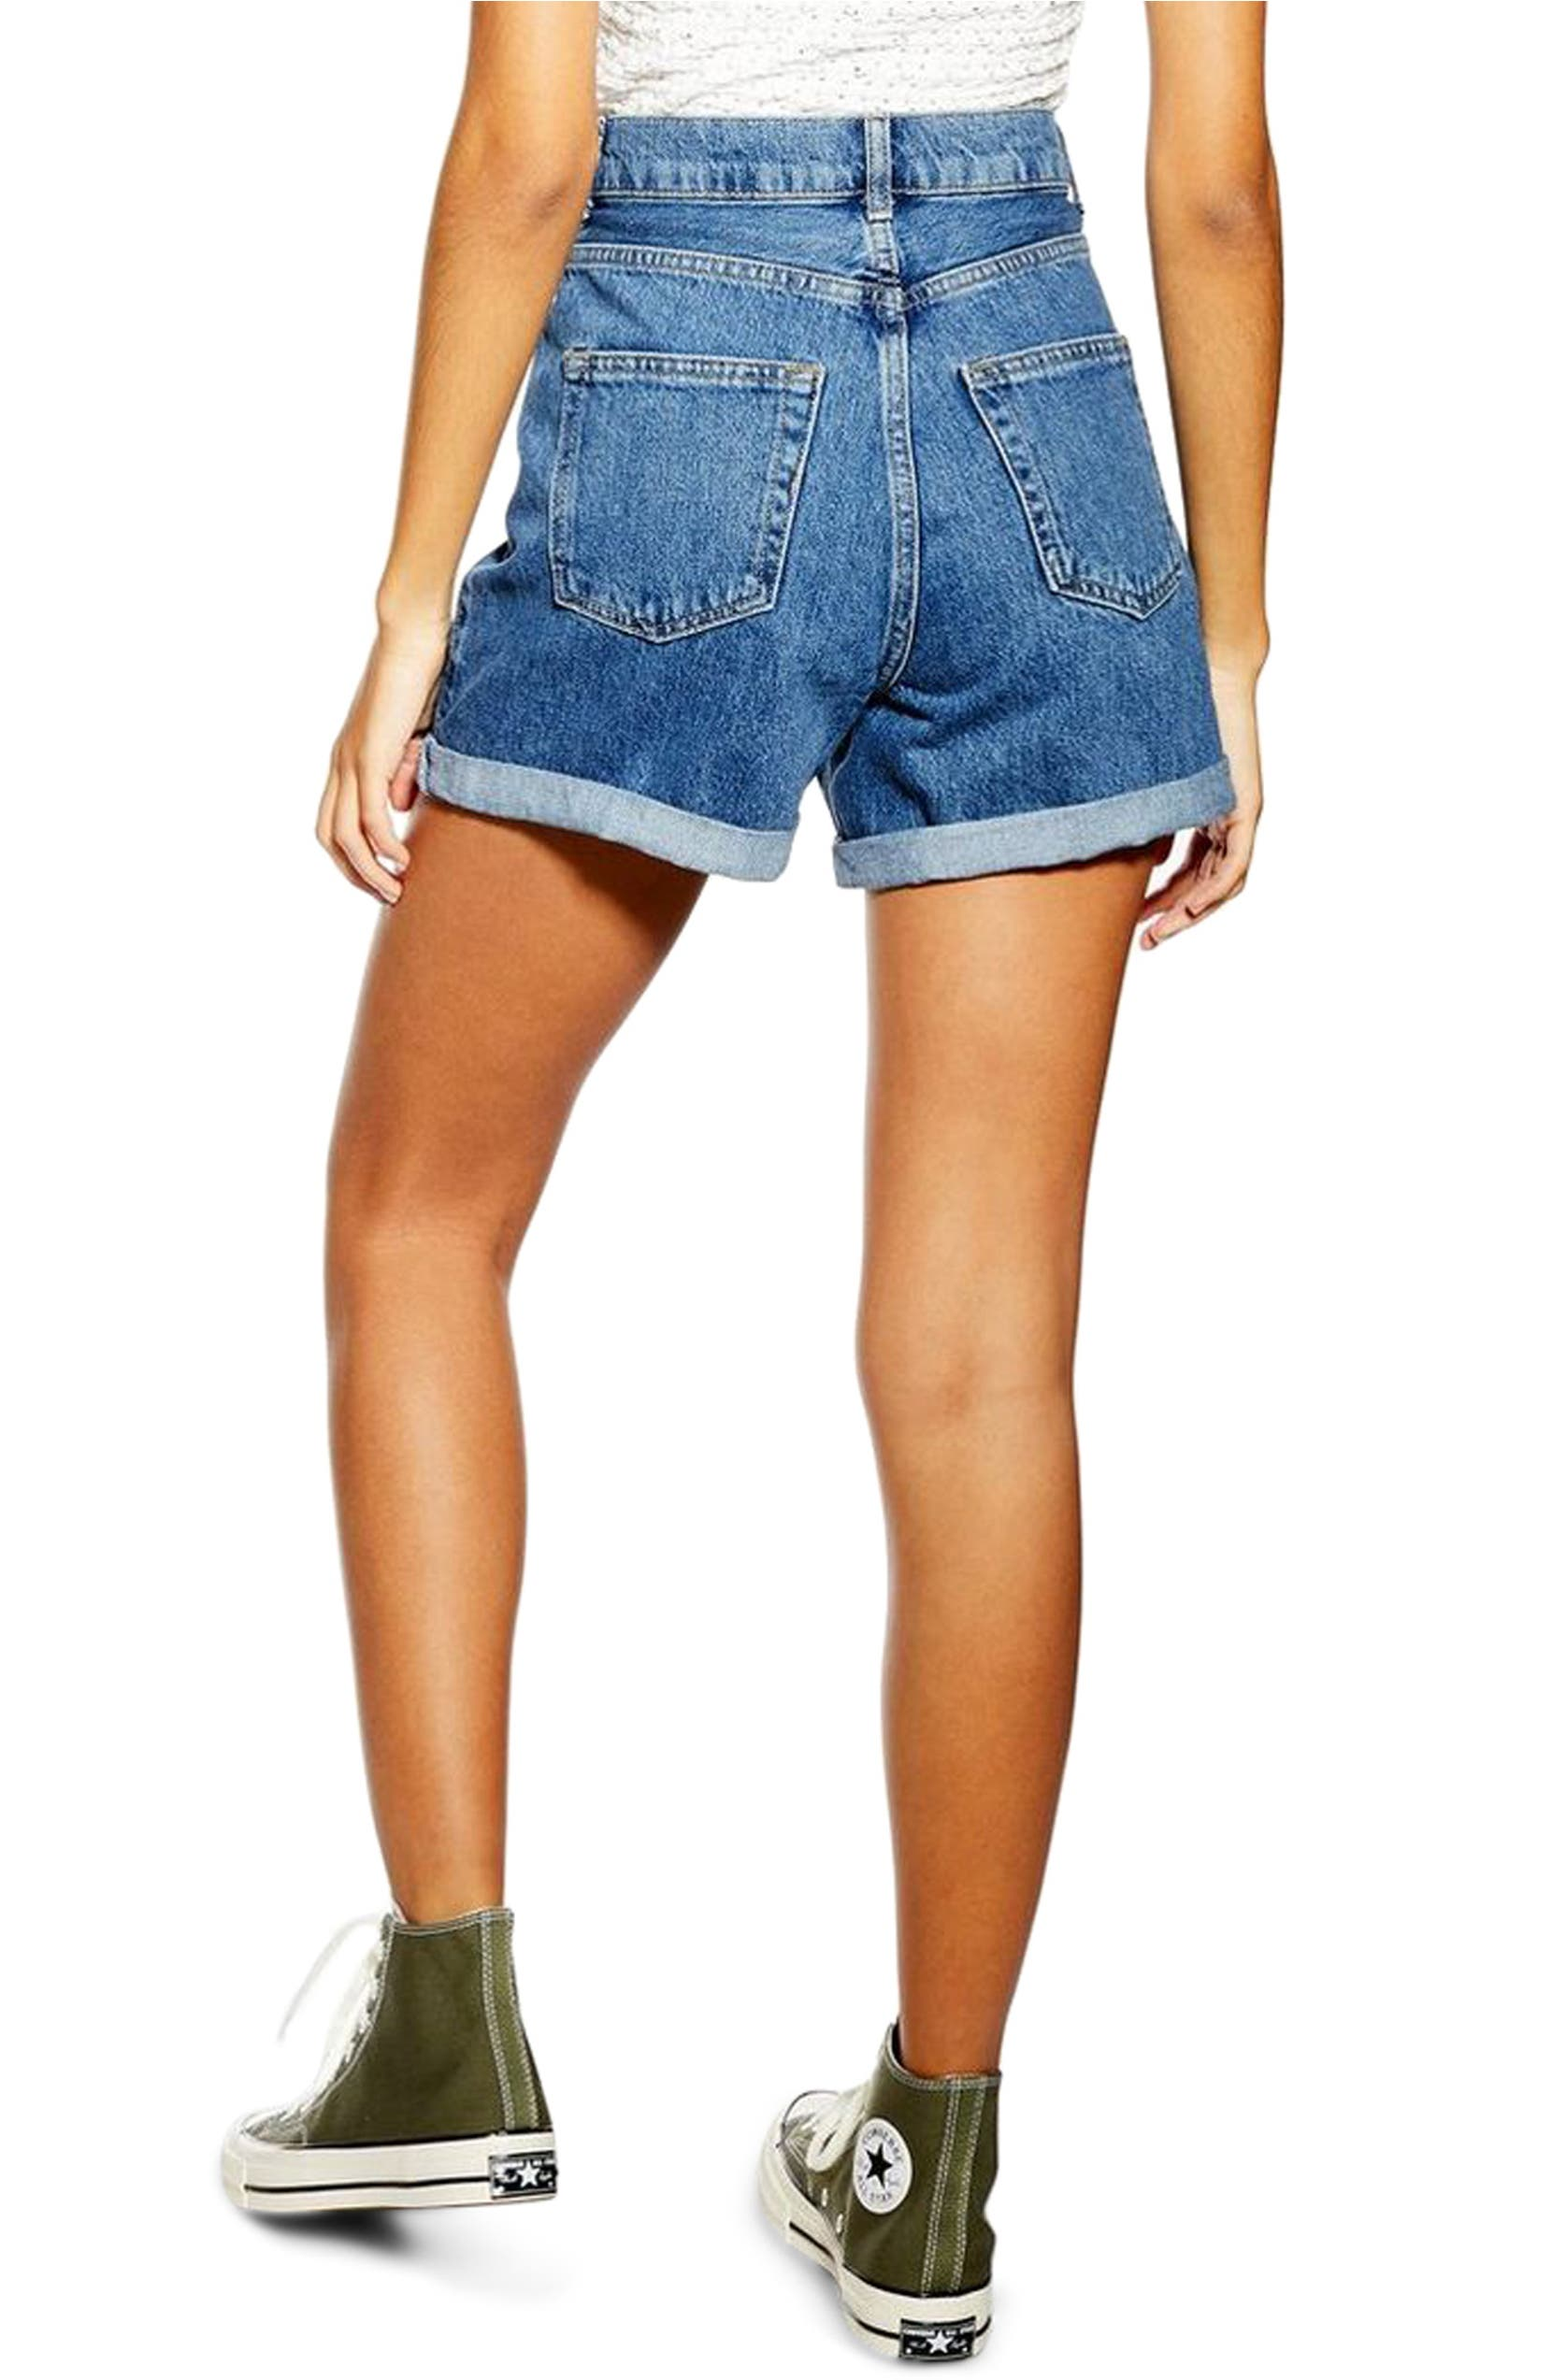 c2210f5a3d1 Topshop Roll Cuff Denim Mom Shorts